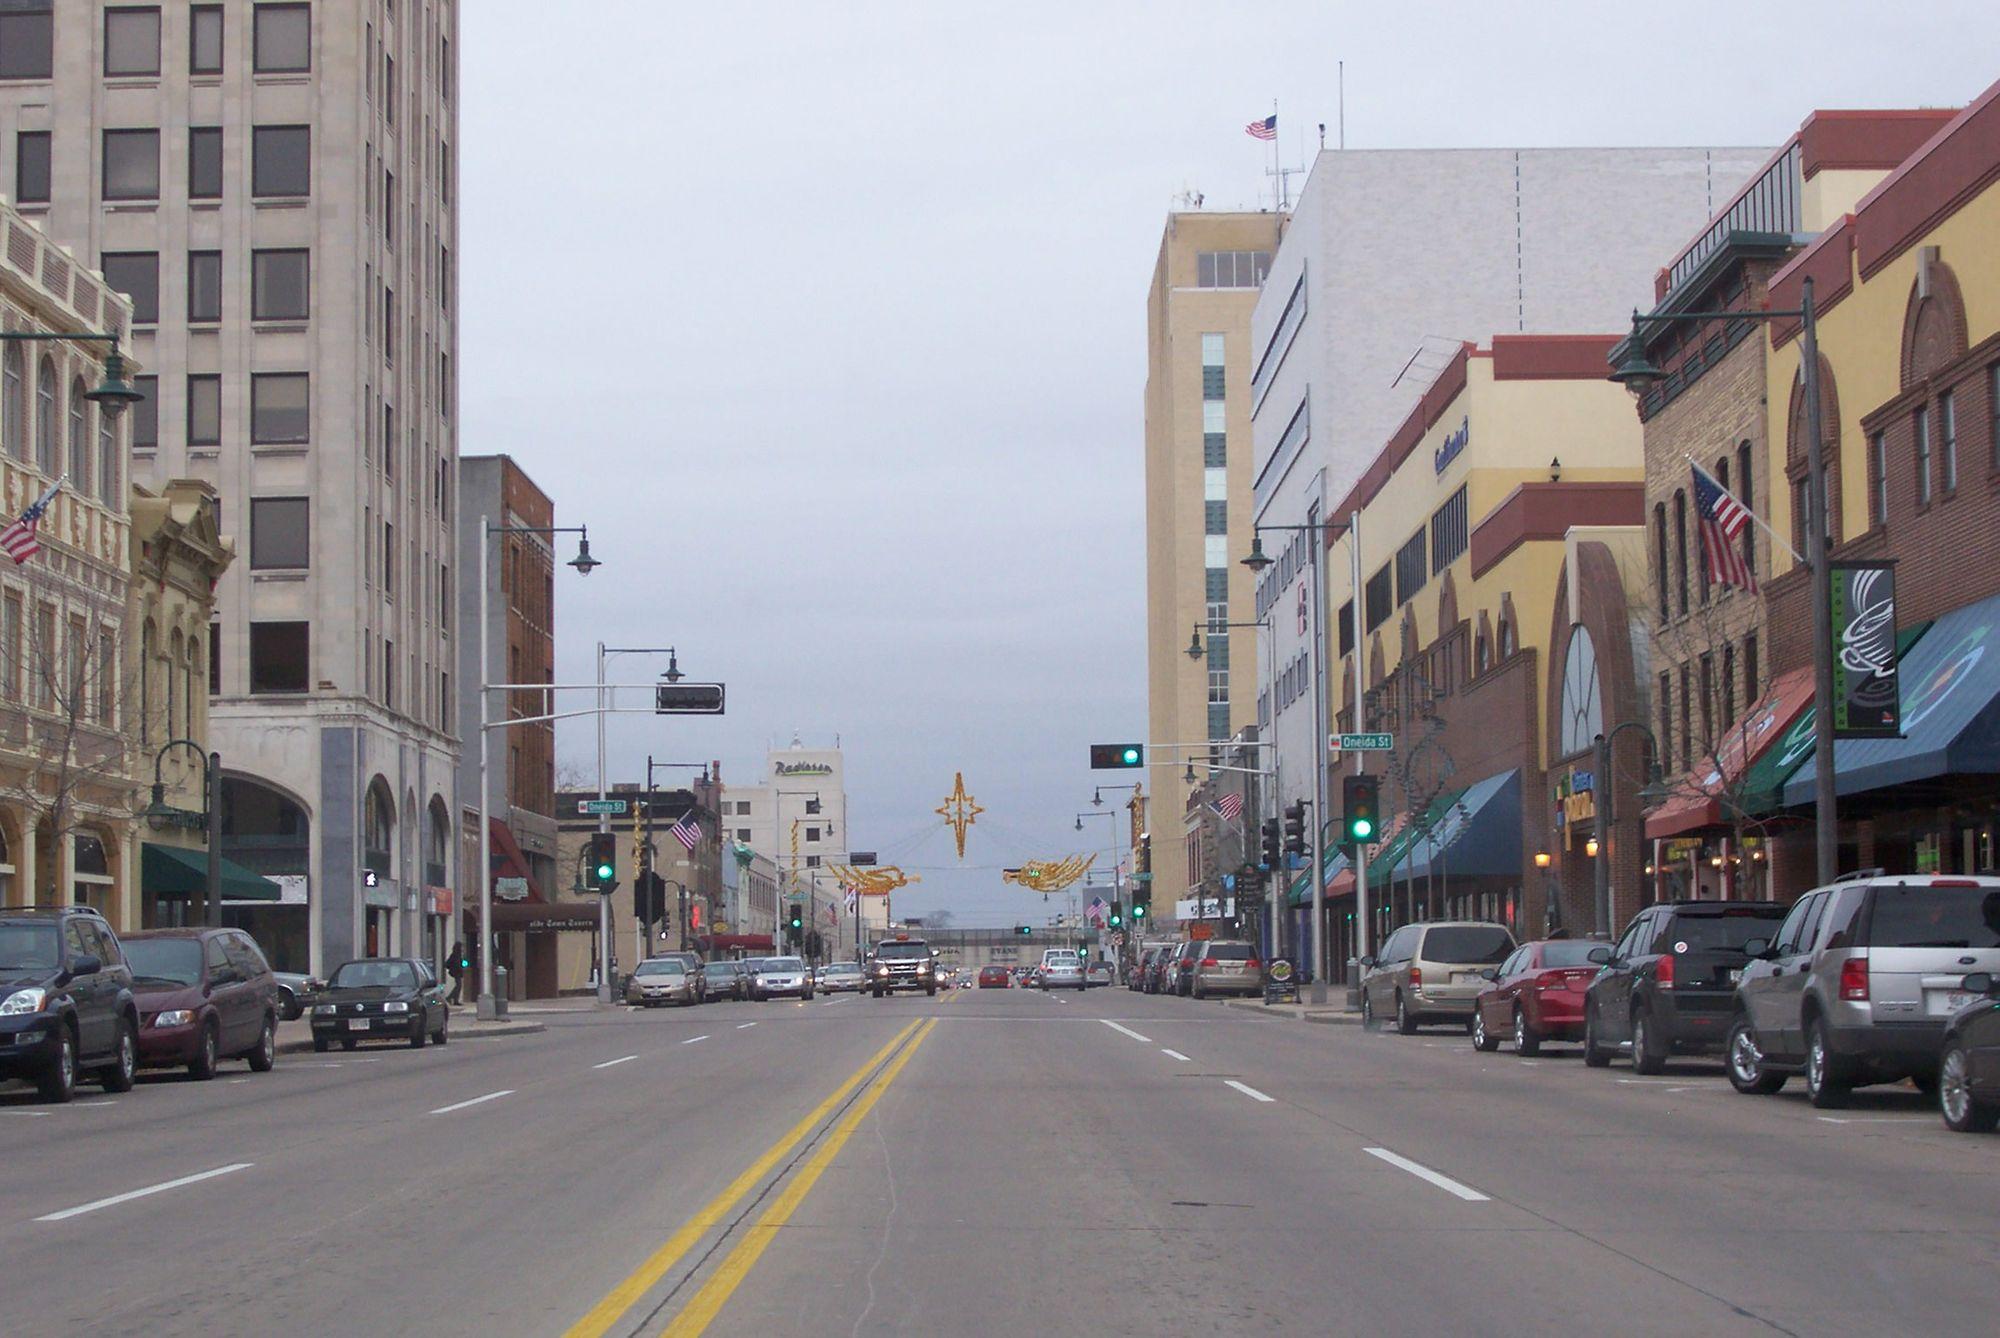 Downtown Appleton